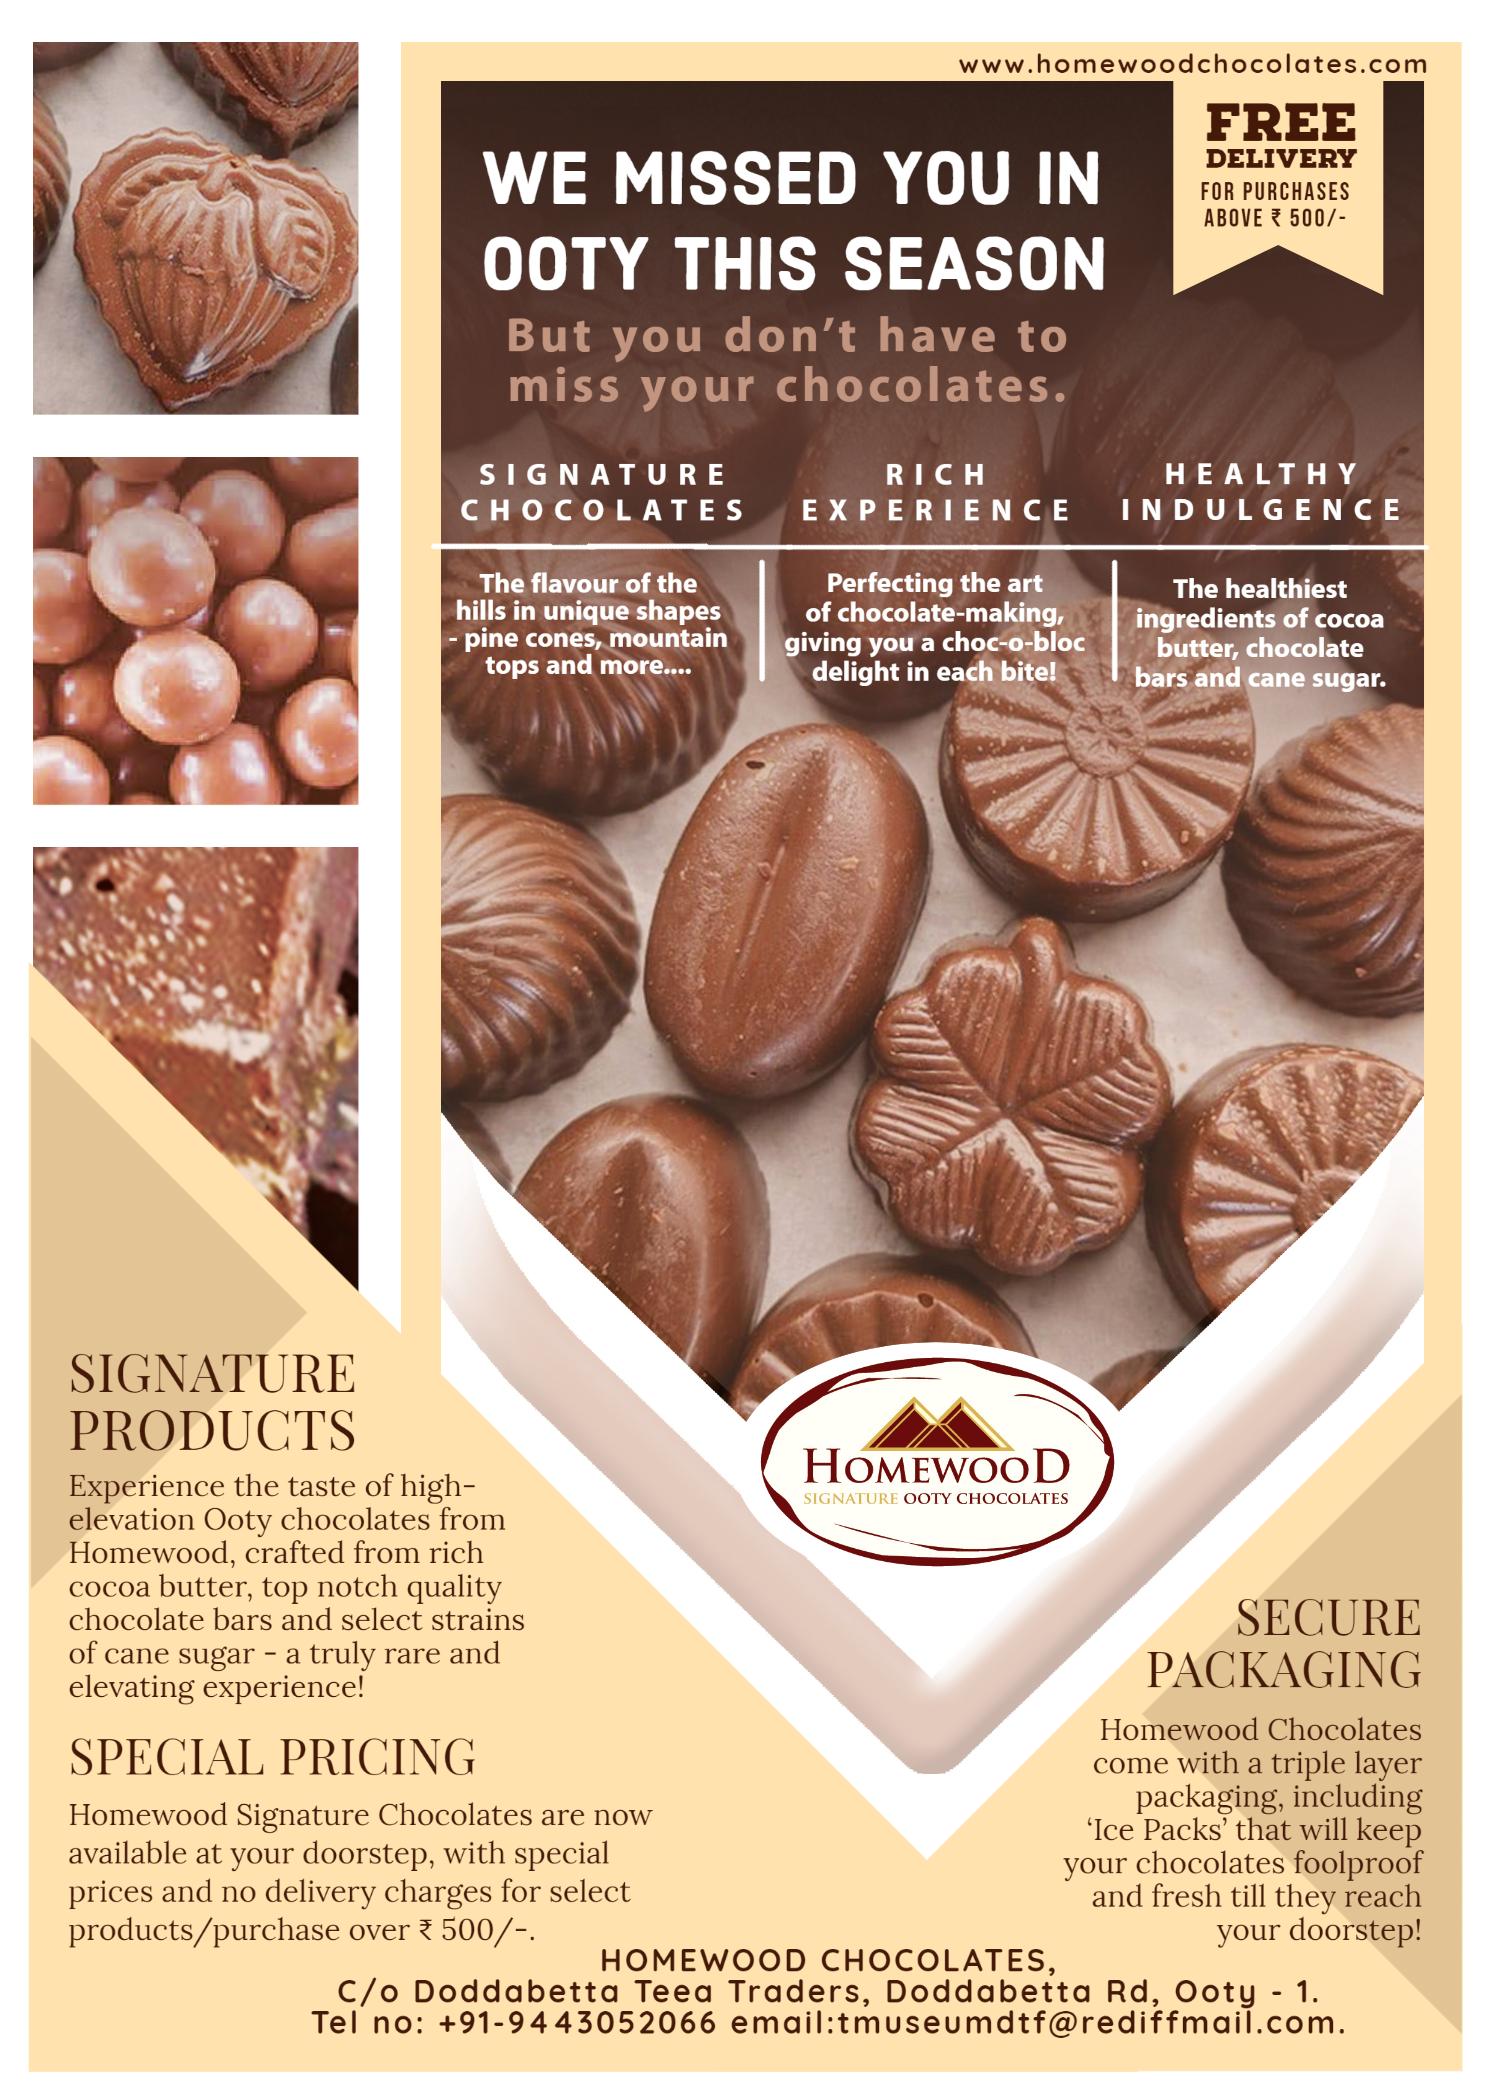 Homewood Chocolates ad